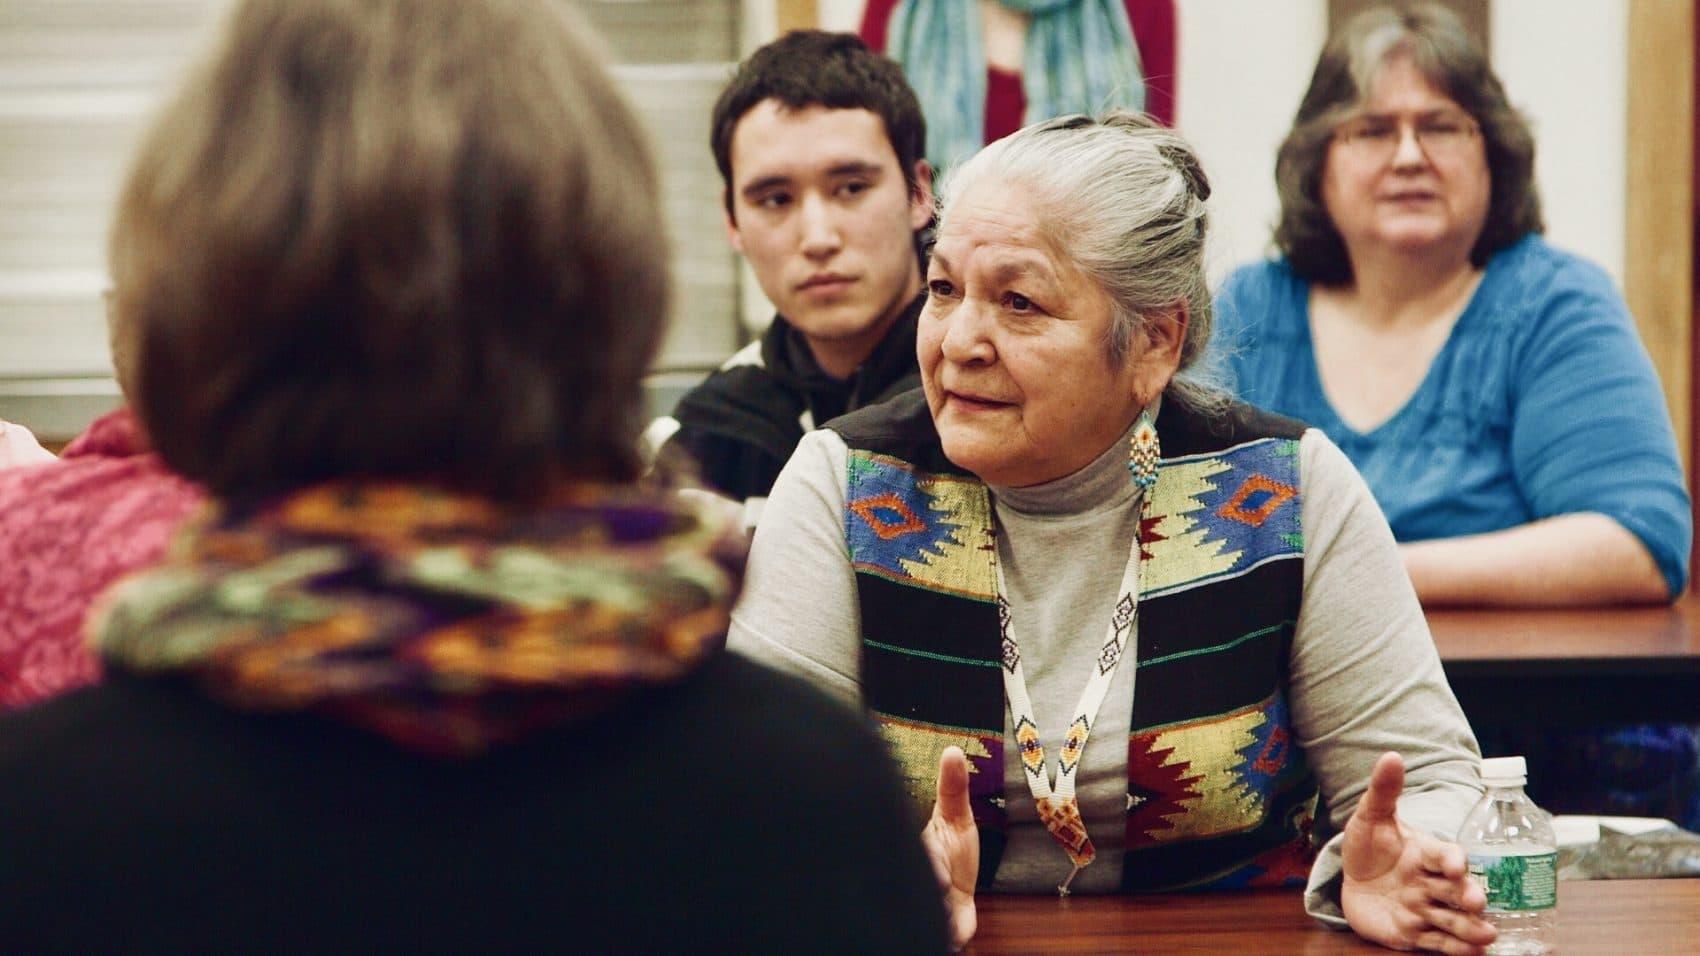 Georginia Sappier-Richardson sharing her story at a TRC community visit. (Courtesy Ben Pender-Cudlip/Upstander Project)